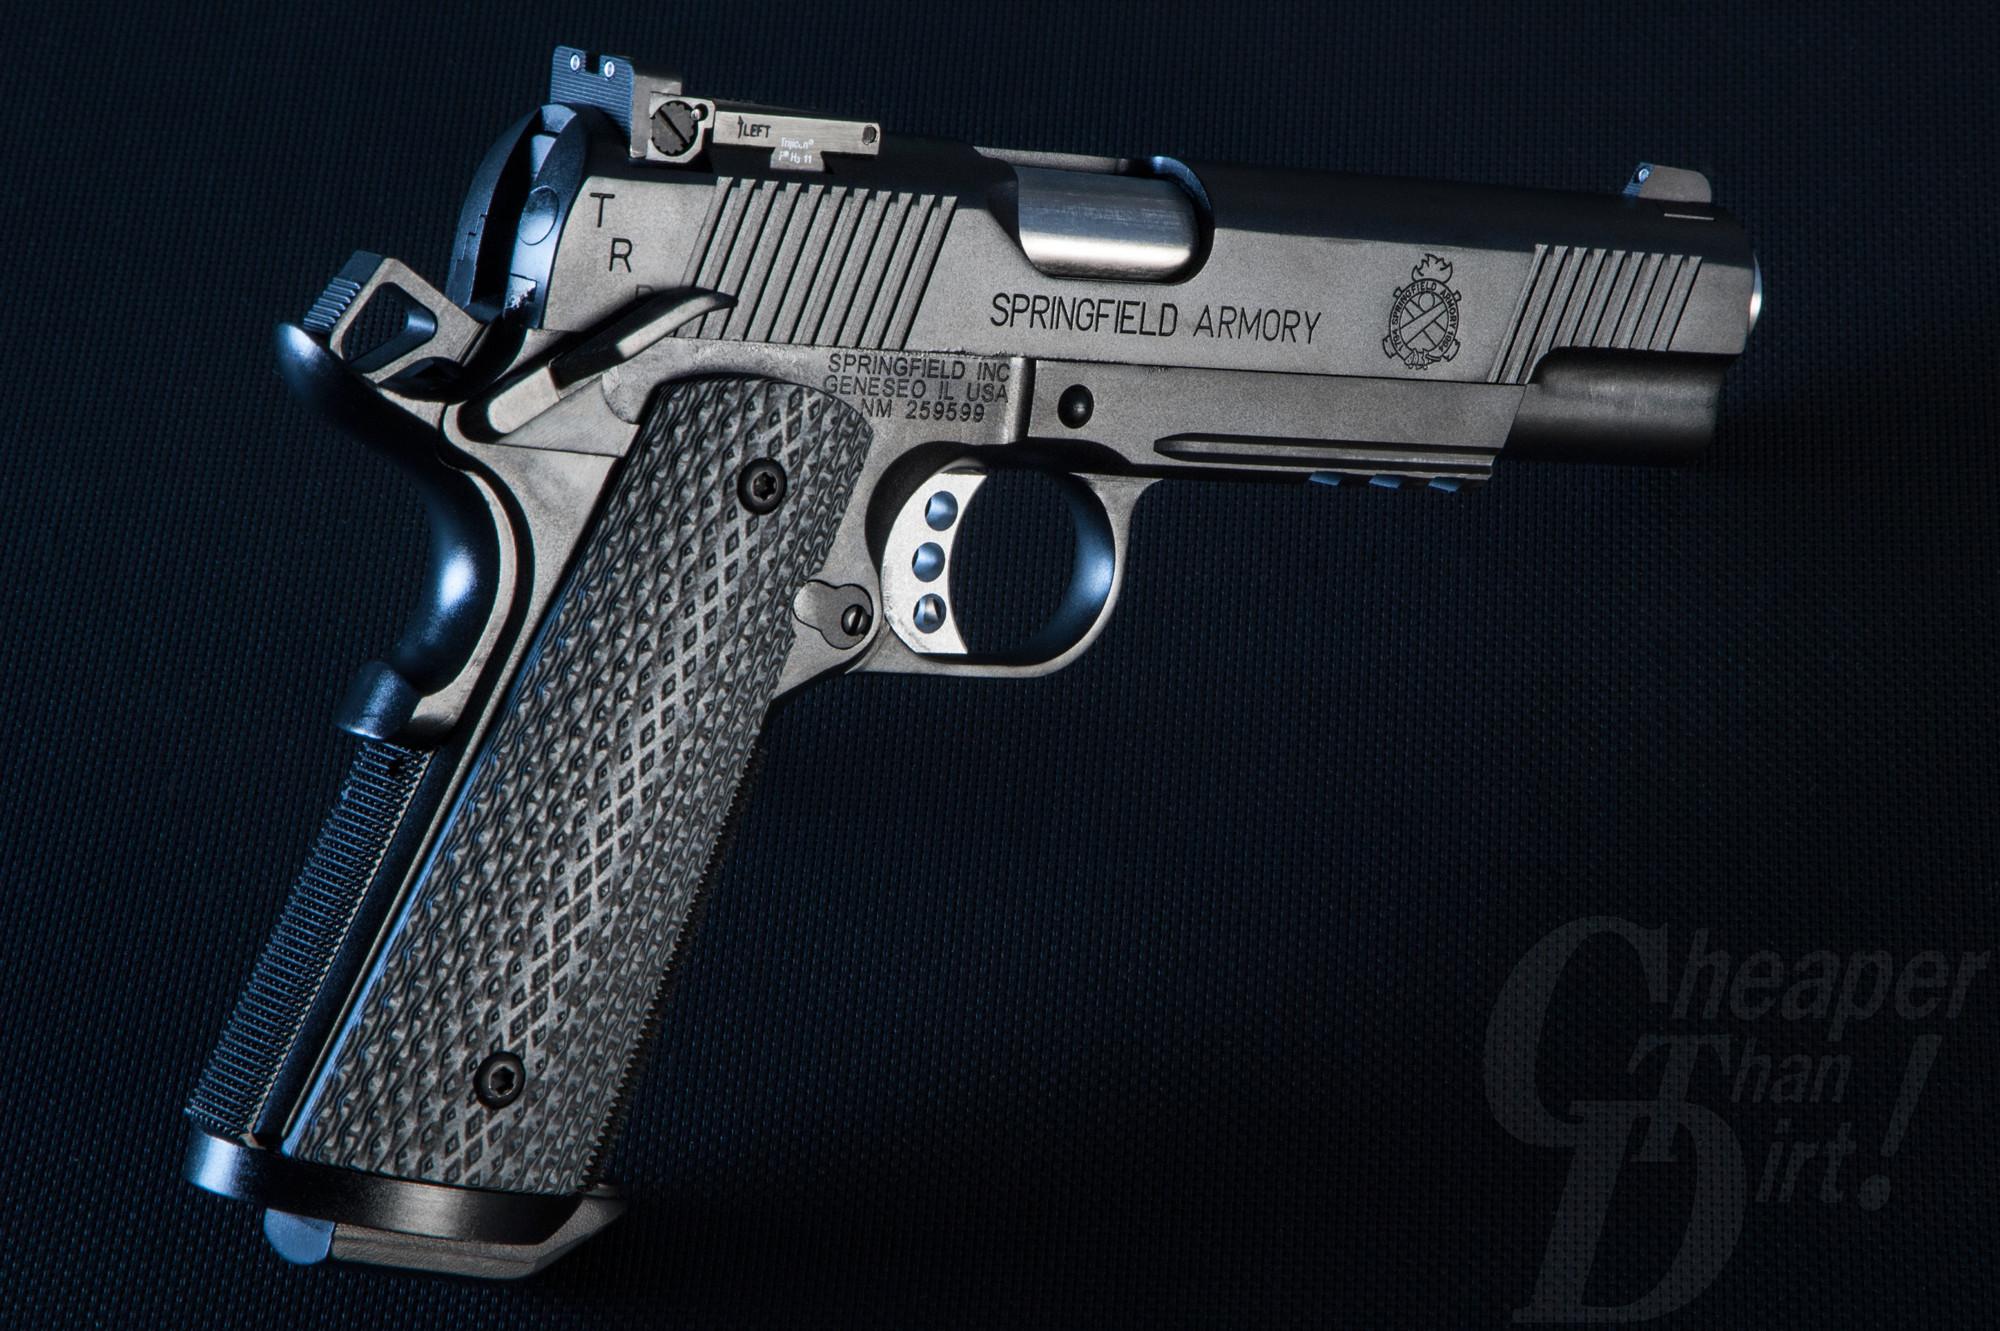 Art of the Gun: The Springfield Armory Tactical Response Pistol .45 ACP